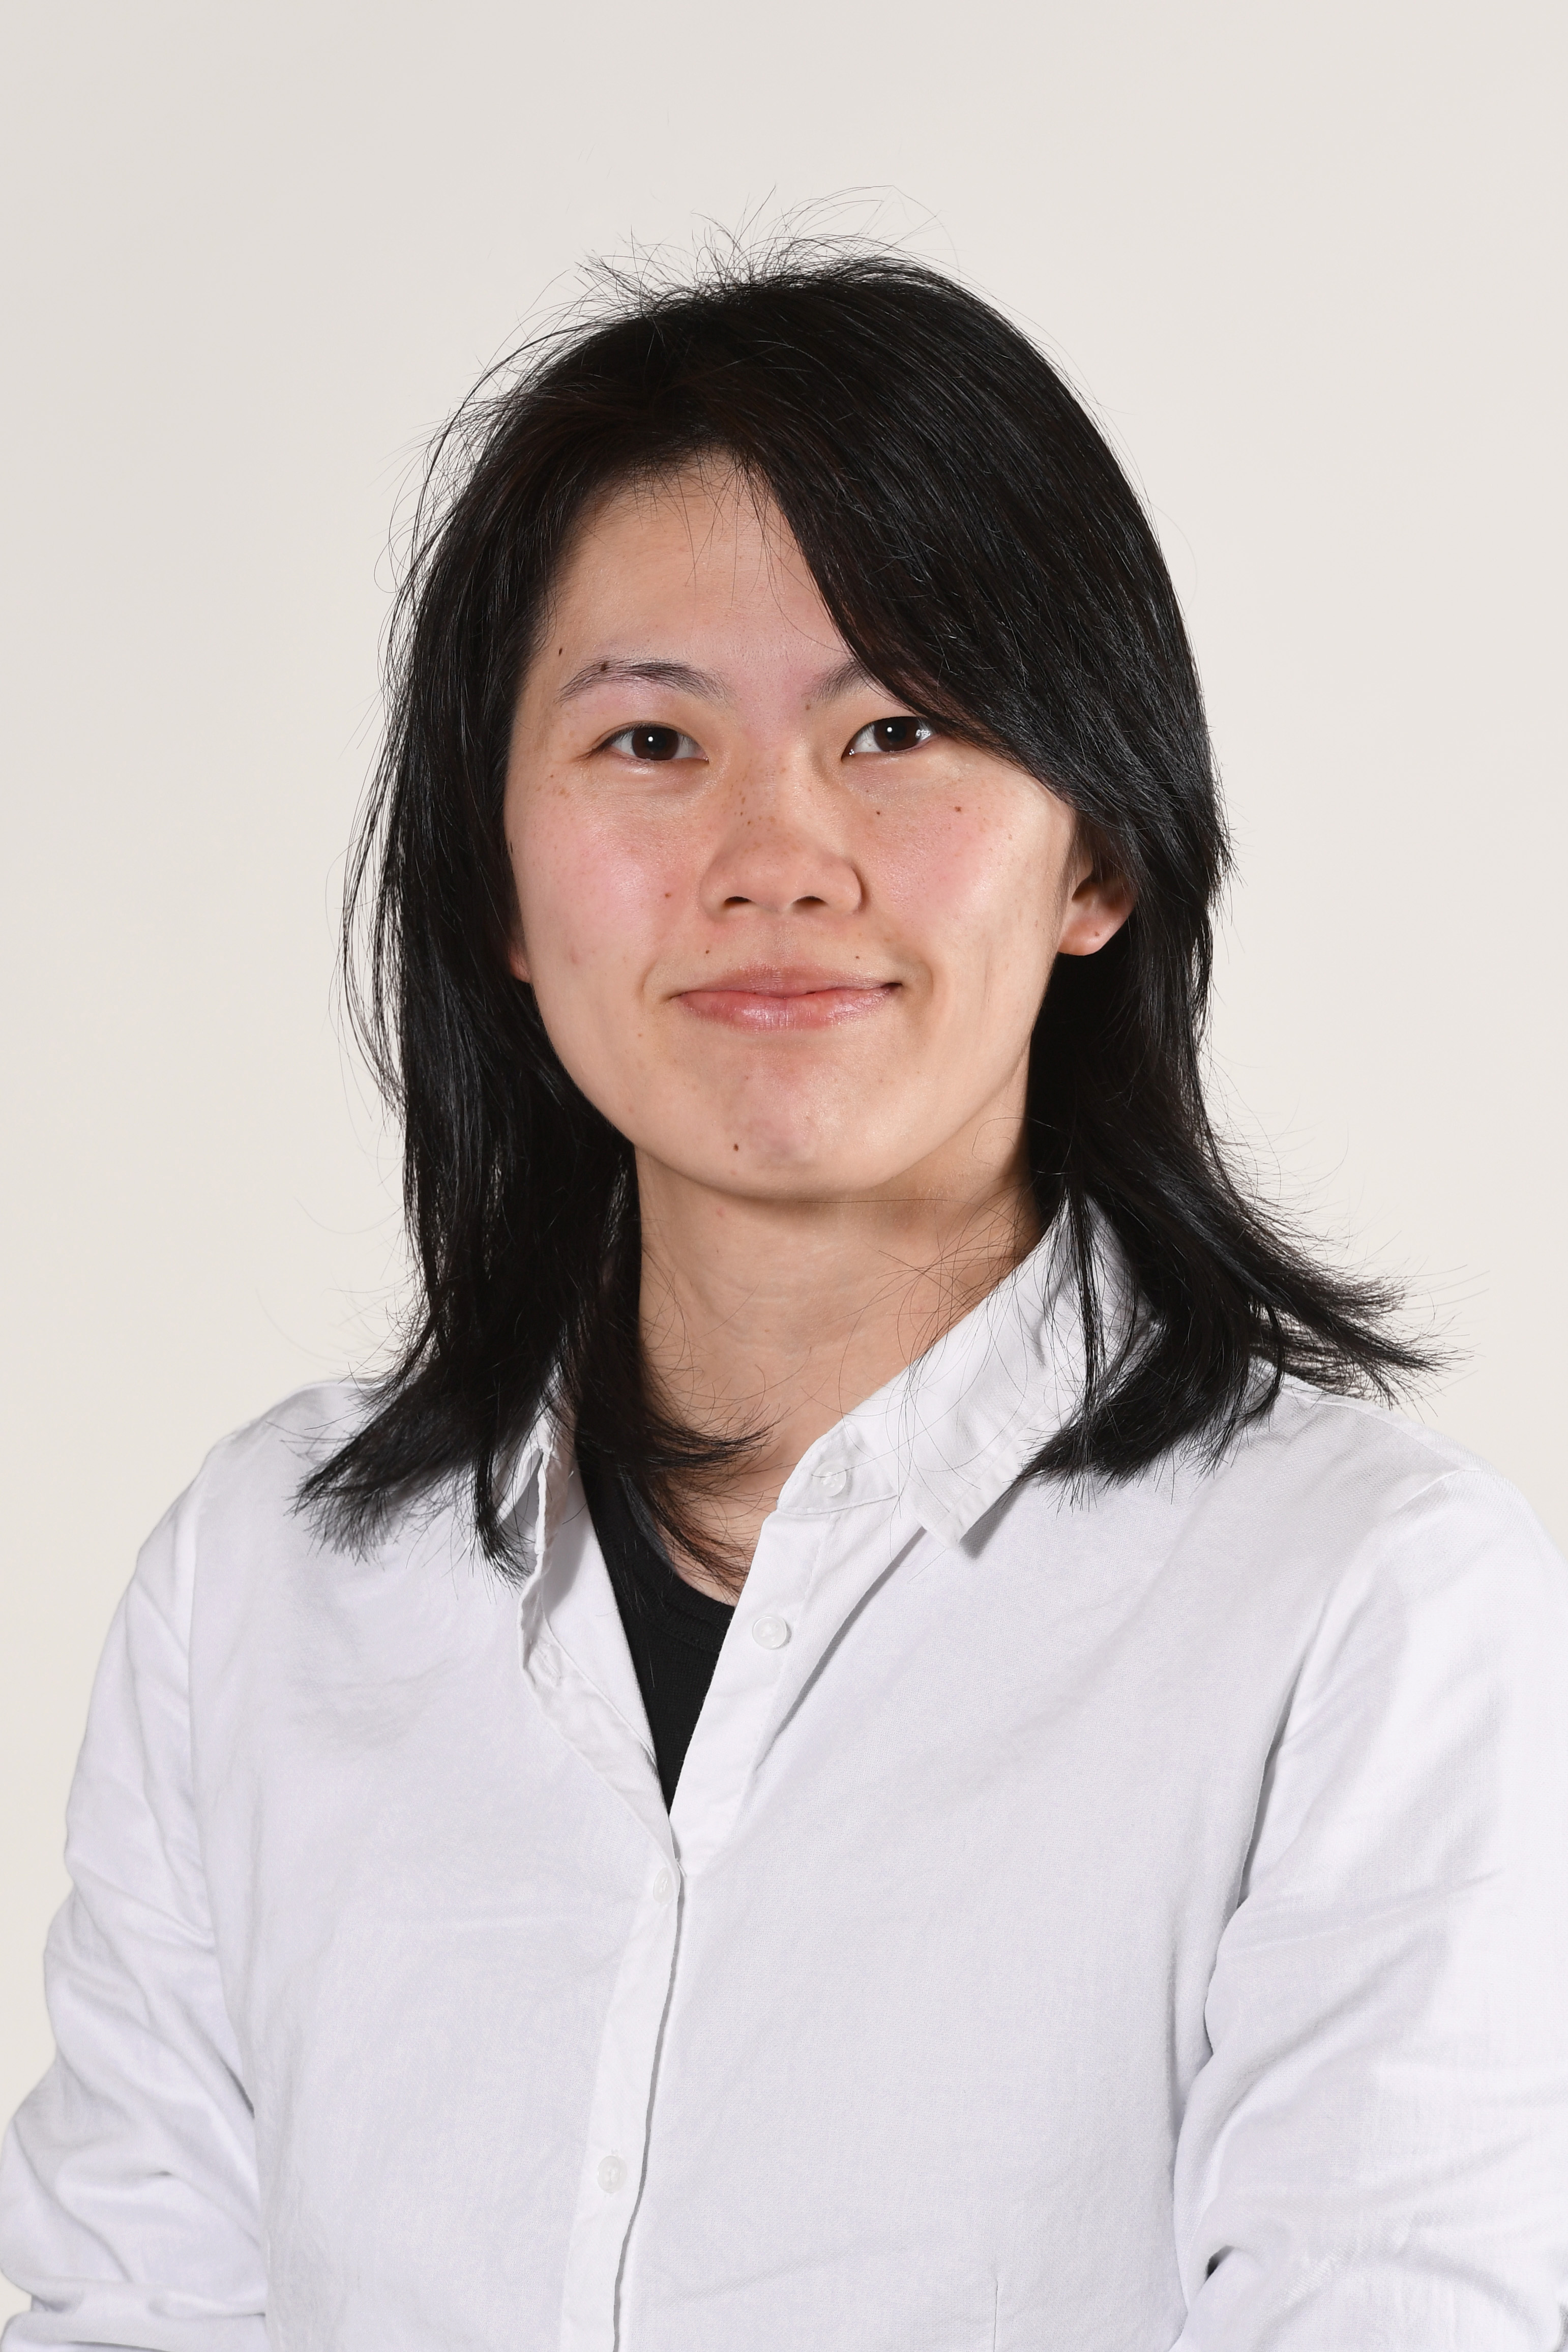 Kelly (Pei-Chi) Hsiao